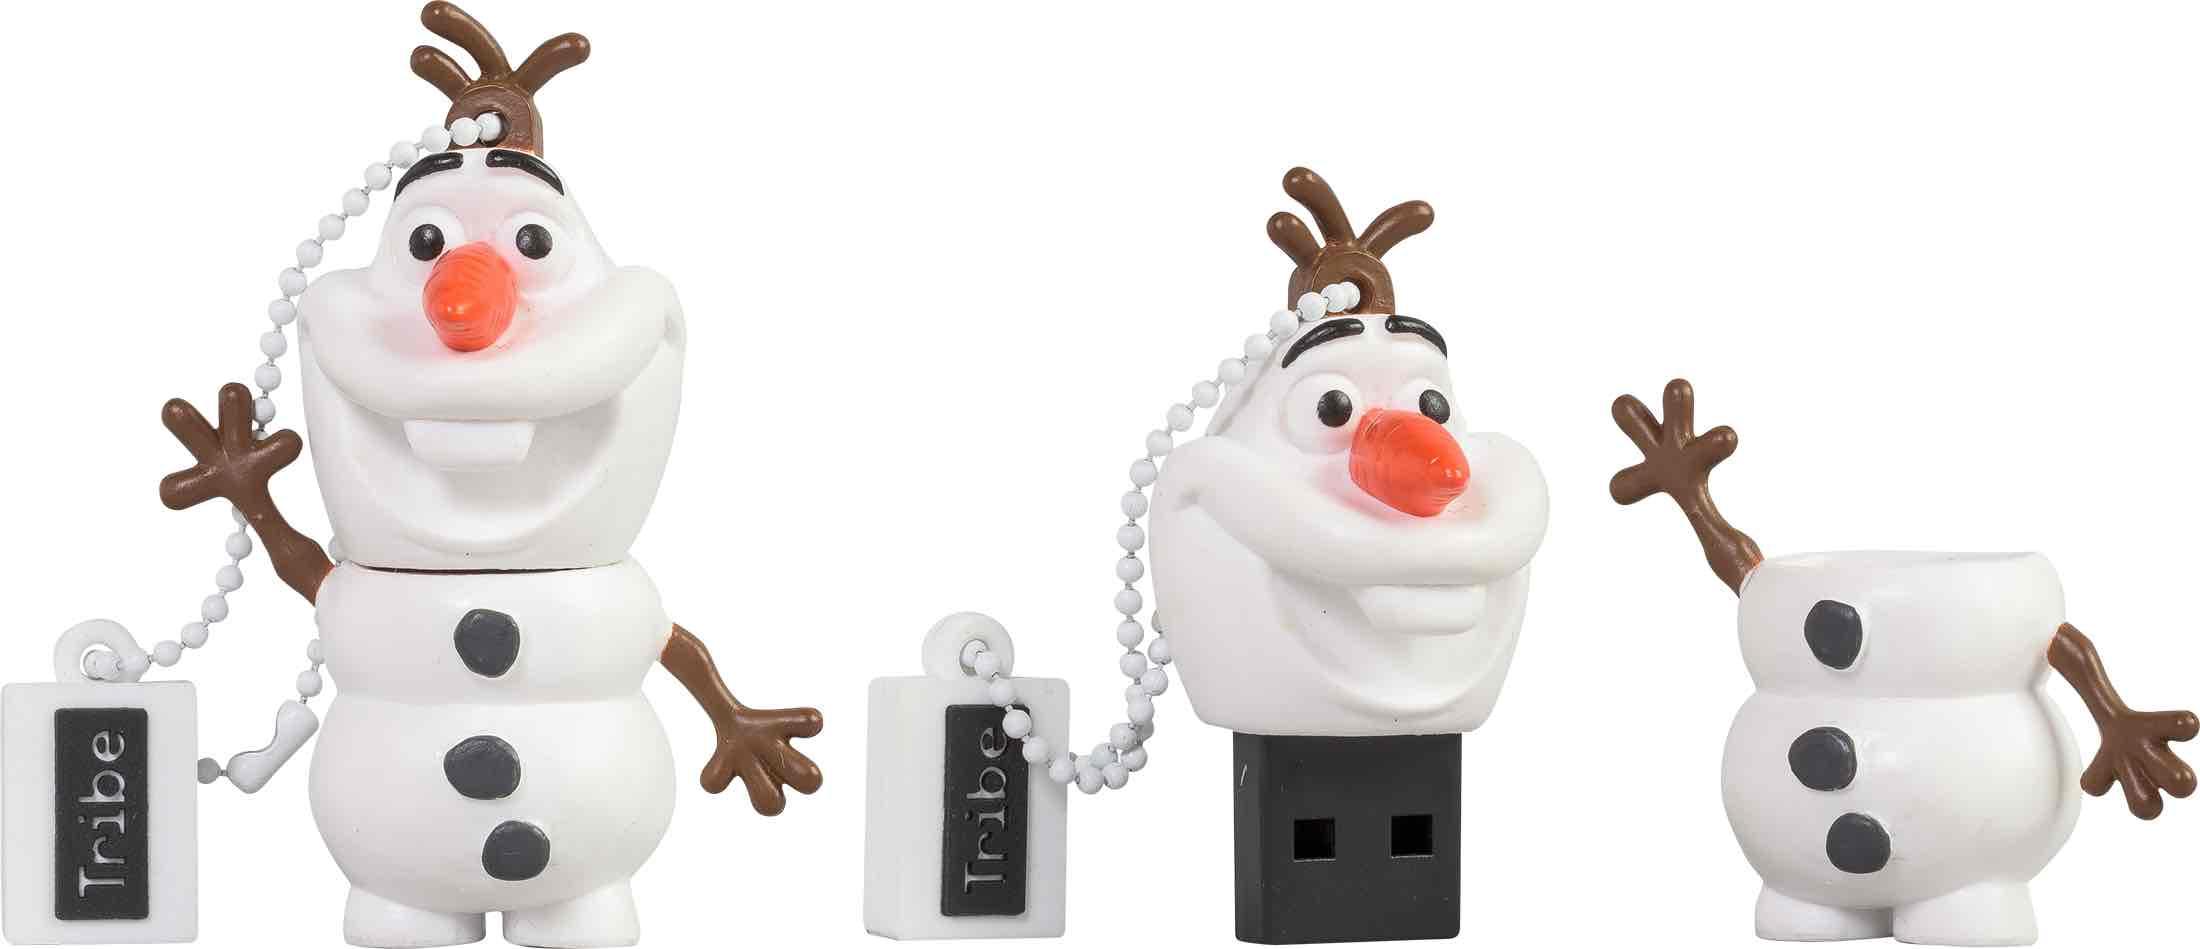 OLAF MEMORIA USB 16 GB PIXAR FROZEN